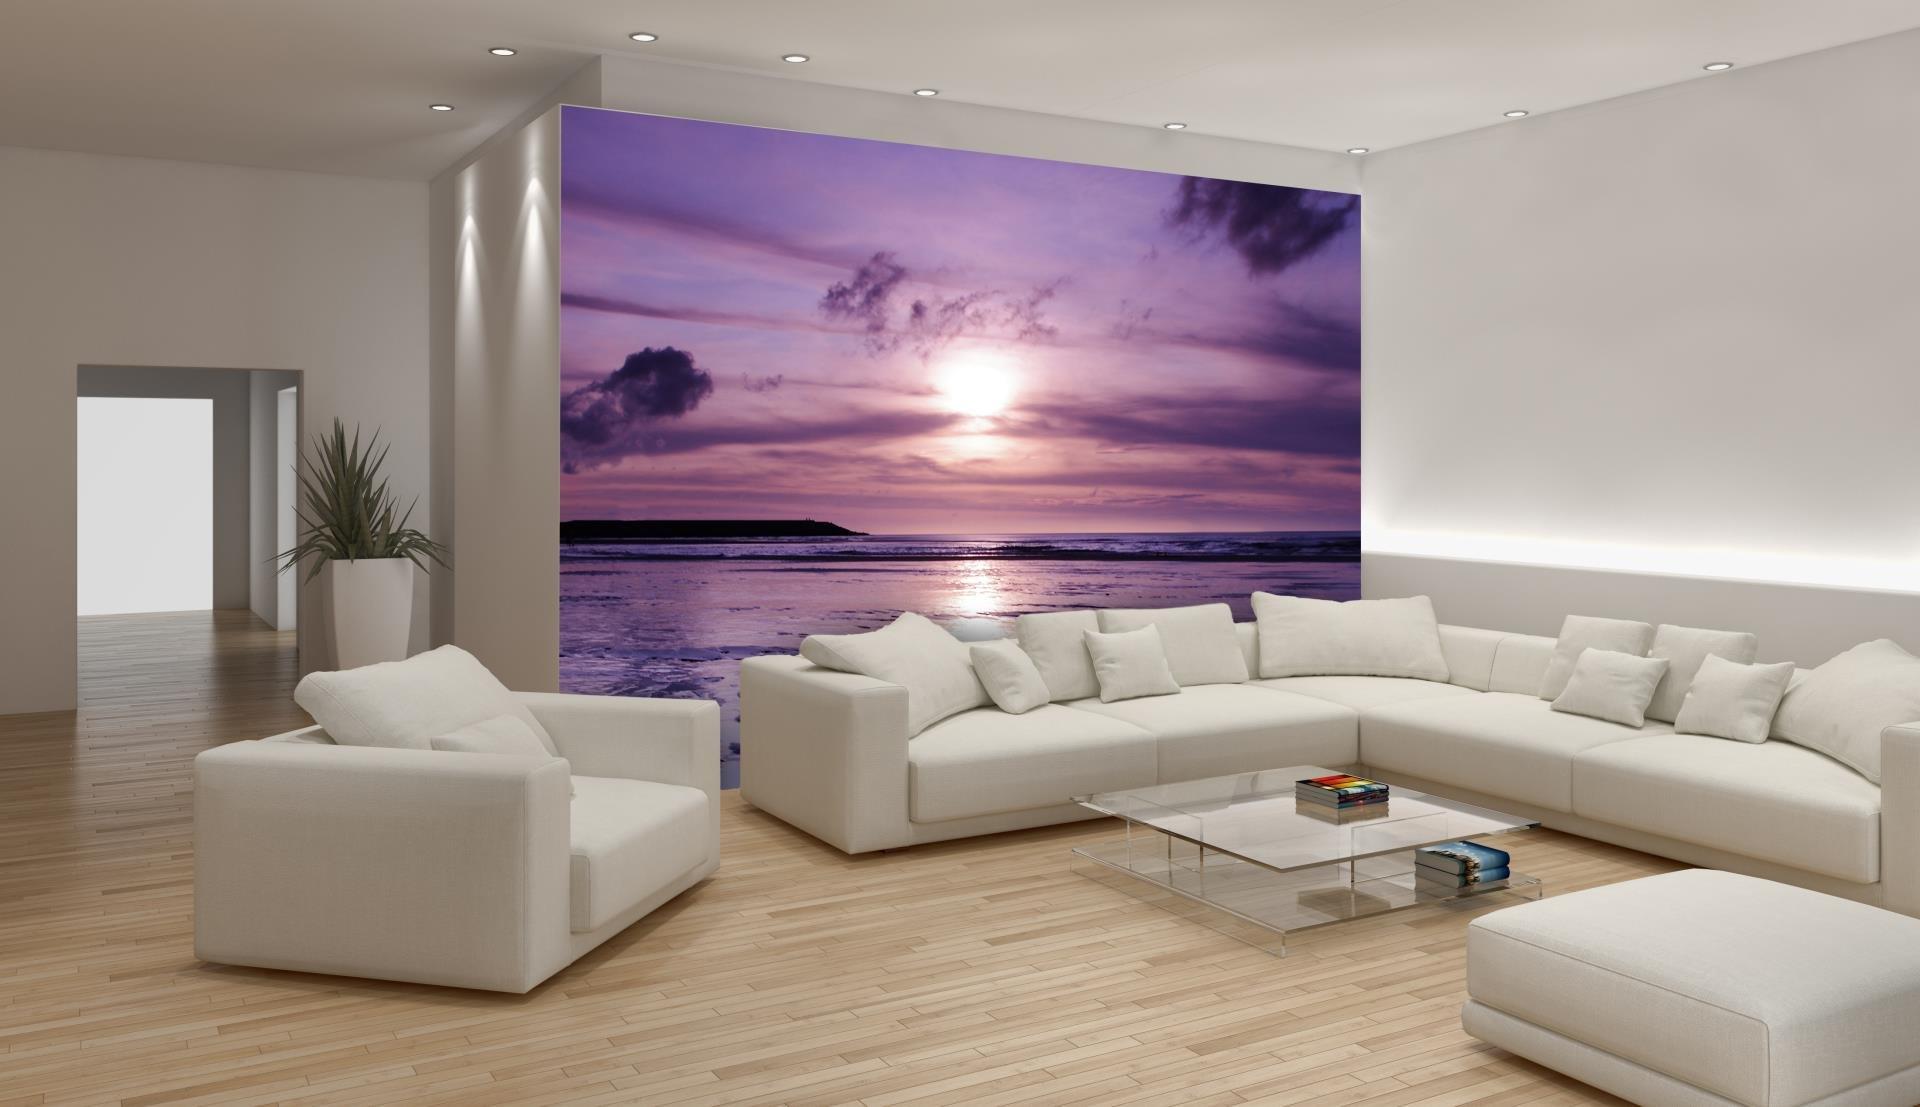 sunset wallpaper amazon co ukpurple sunset wallpaper mural